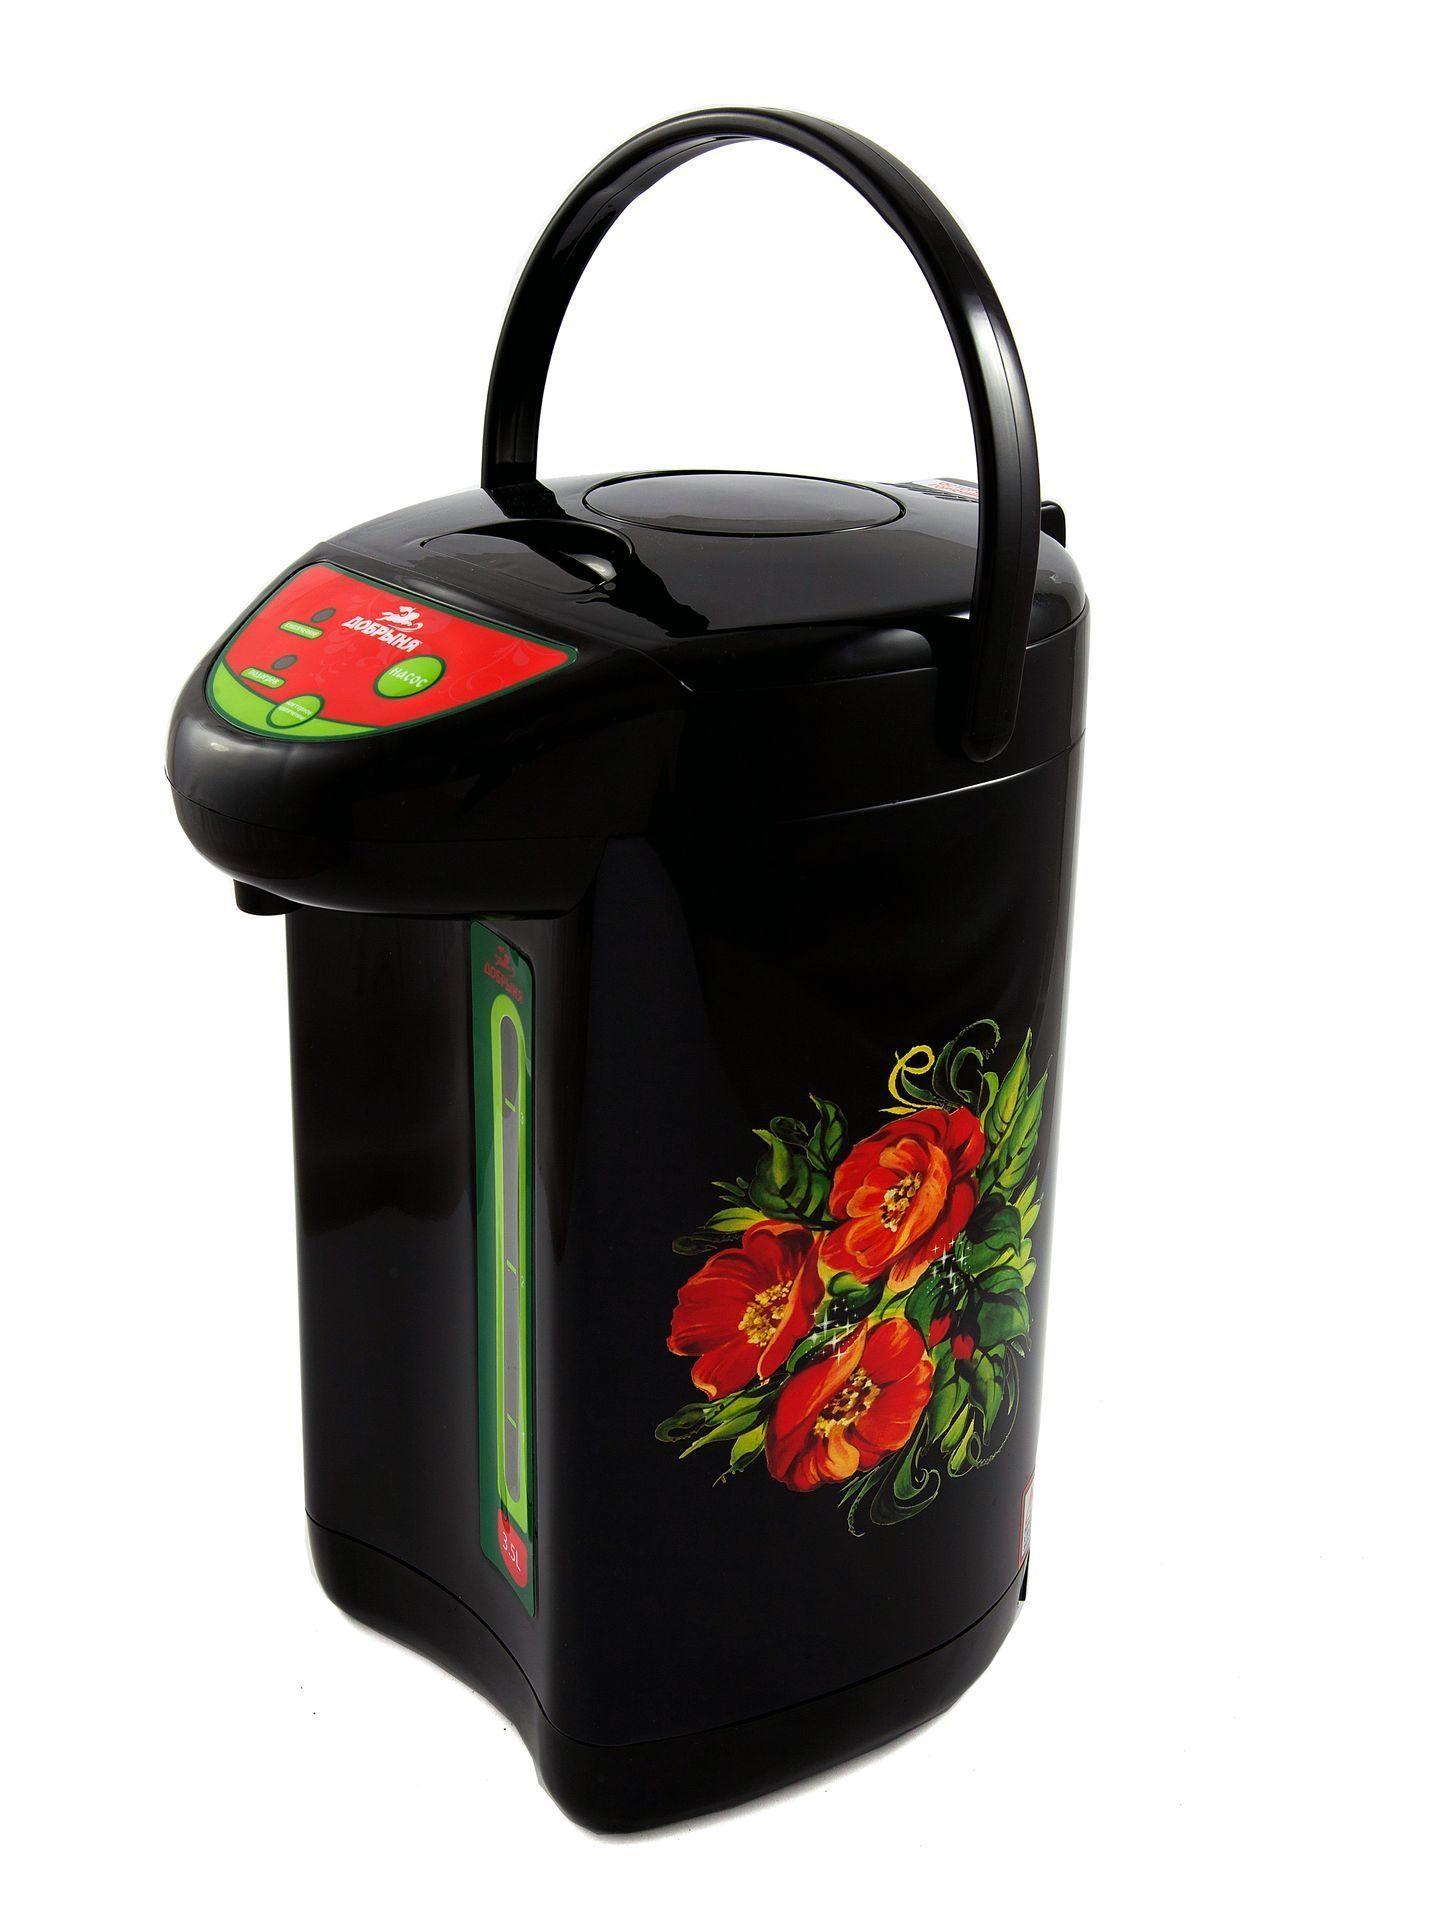 Термопот/ Термос-чайник (термопот) Добрыня DO 485 маки